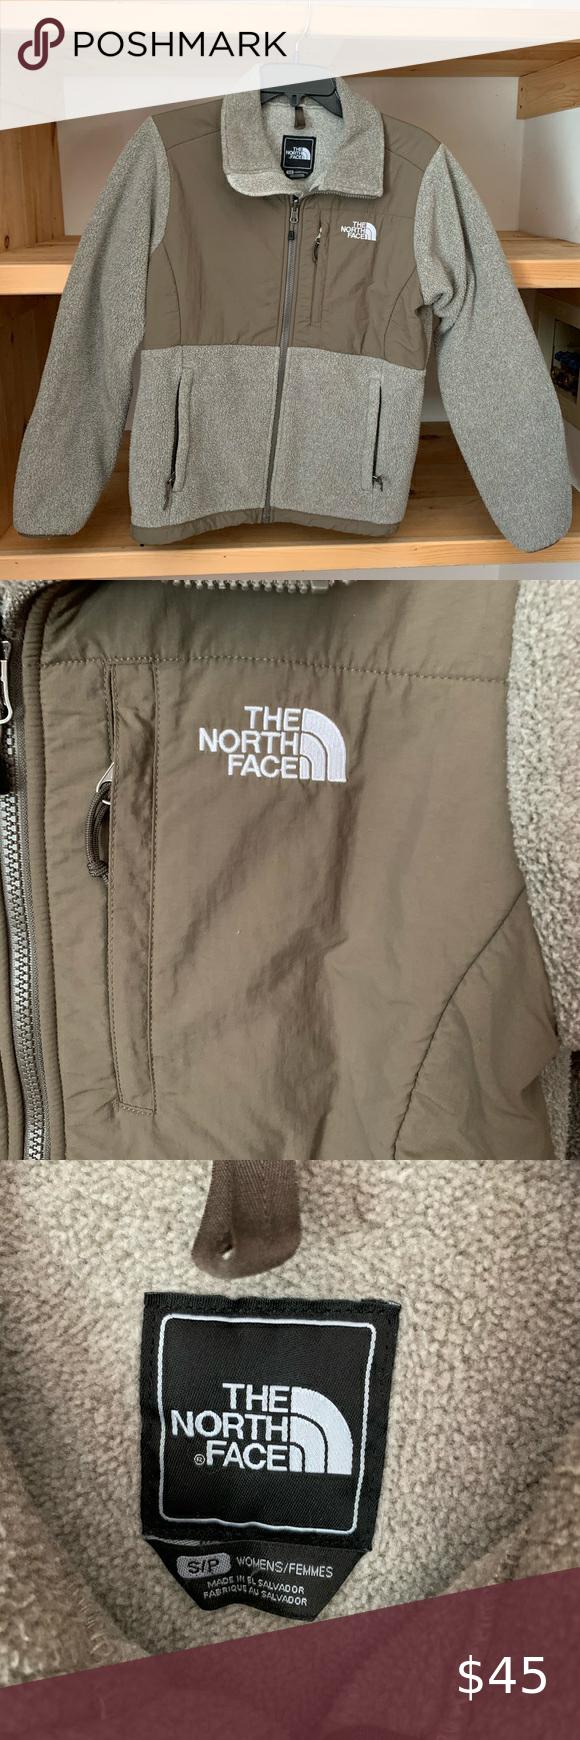 The North Face Denali Jacket Tan Briwn The North Face North Face Jacket Dark Brown Color [ 1740 x 580 Pixel ]